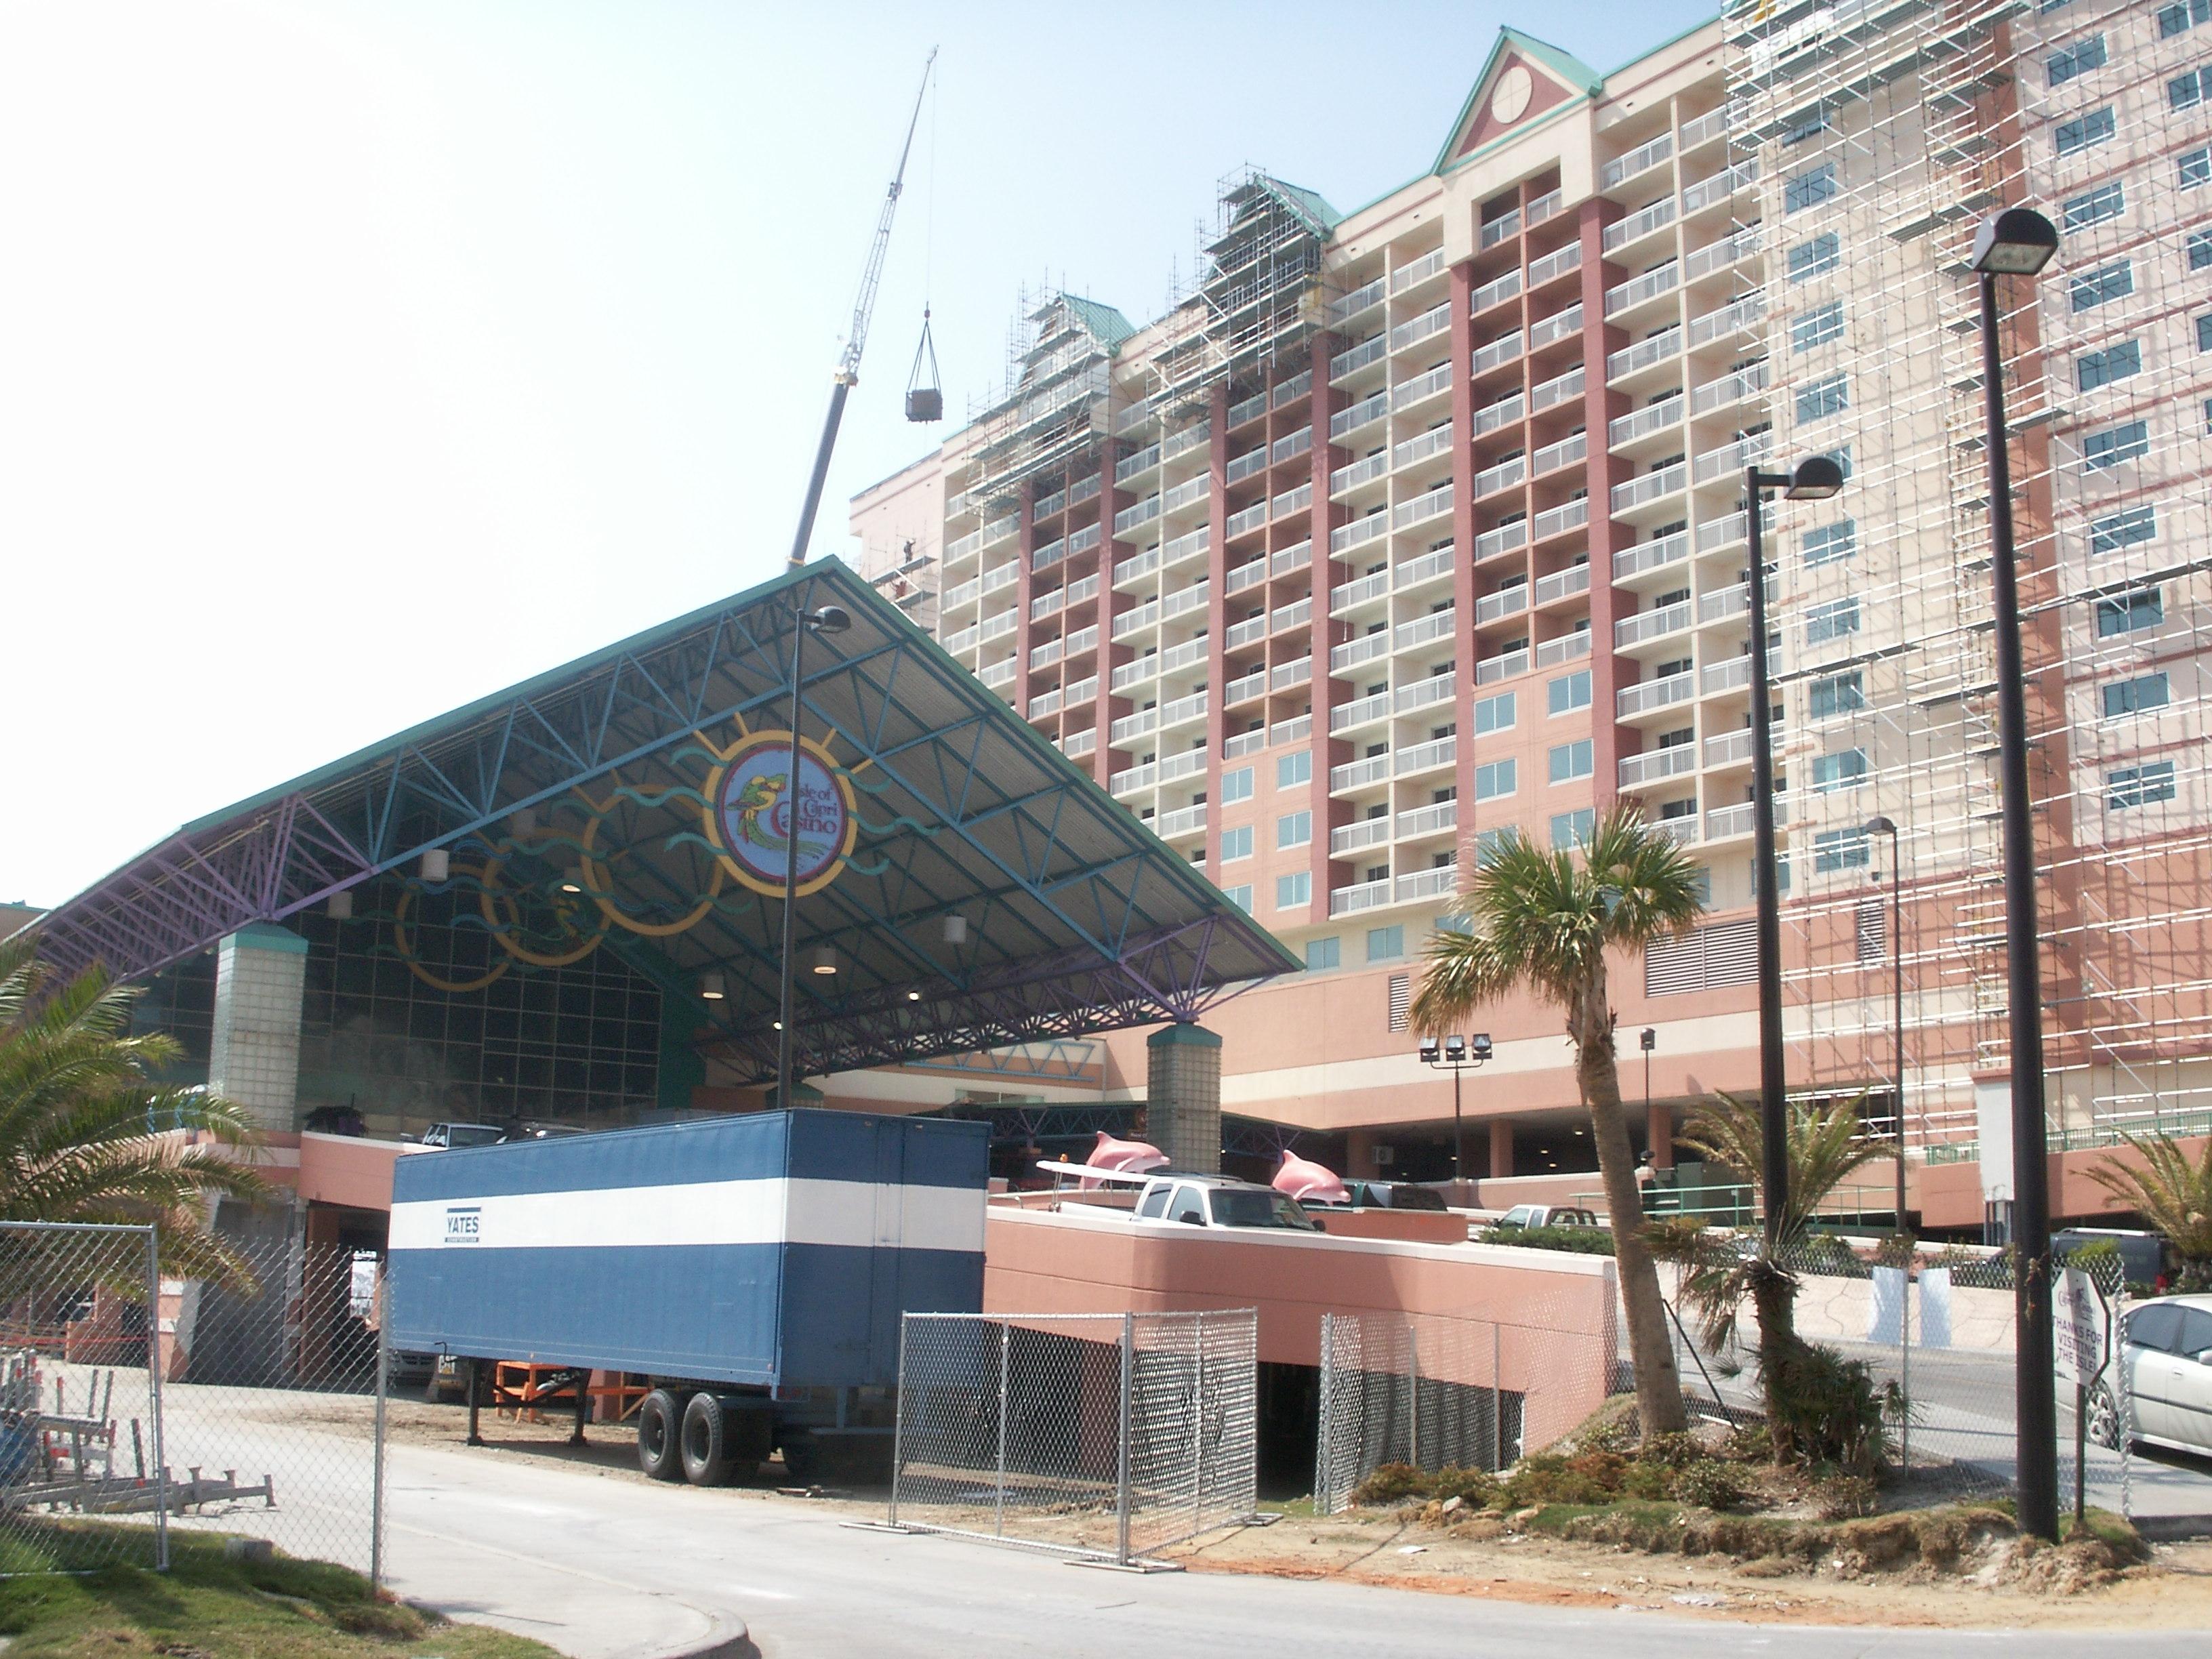 The grand casino in mississippi 14